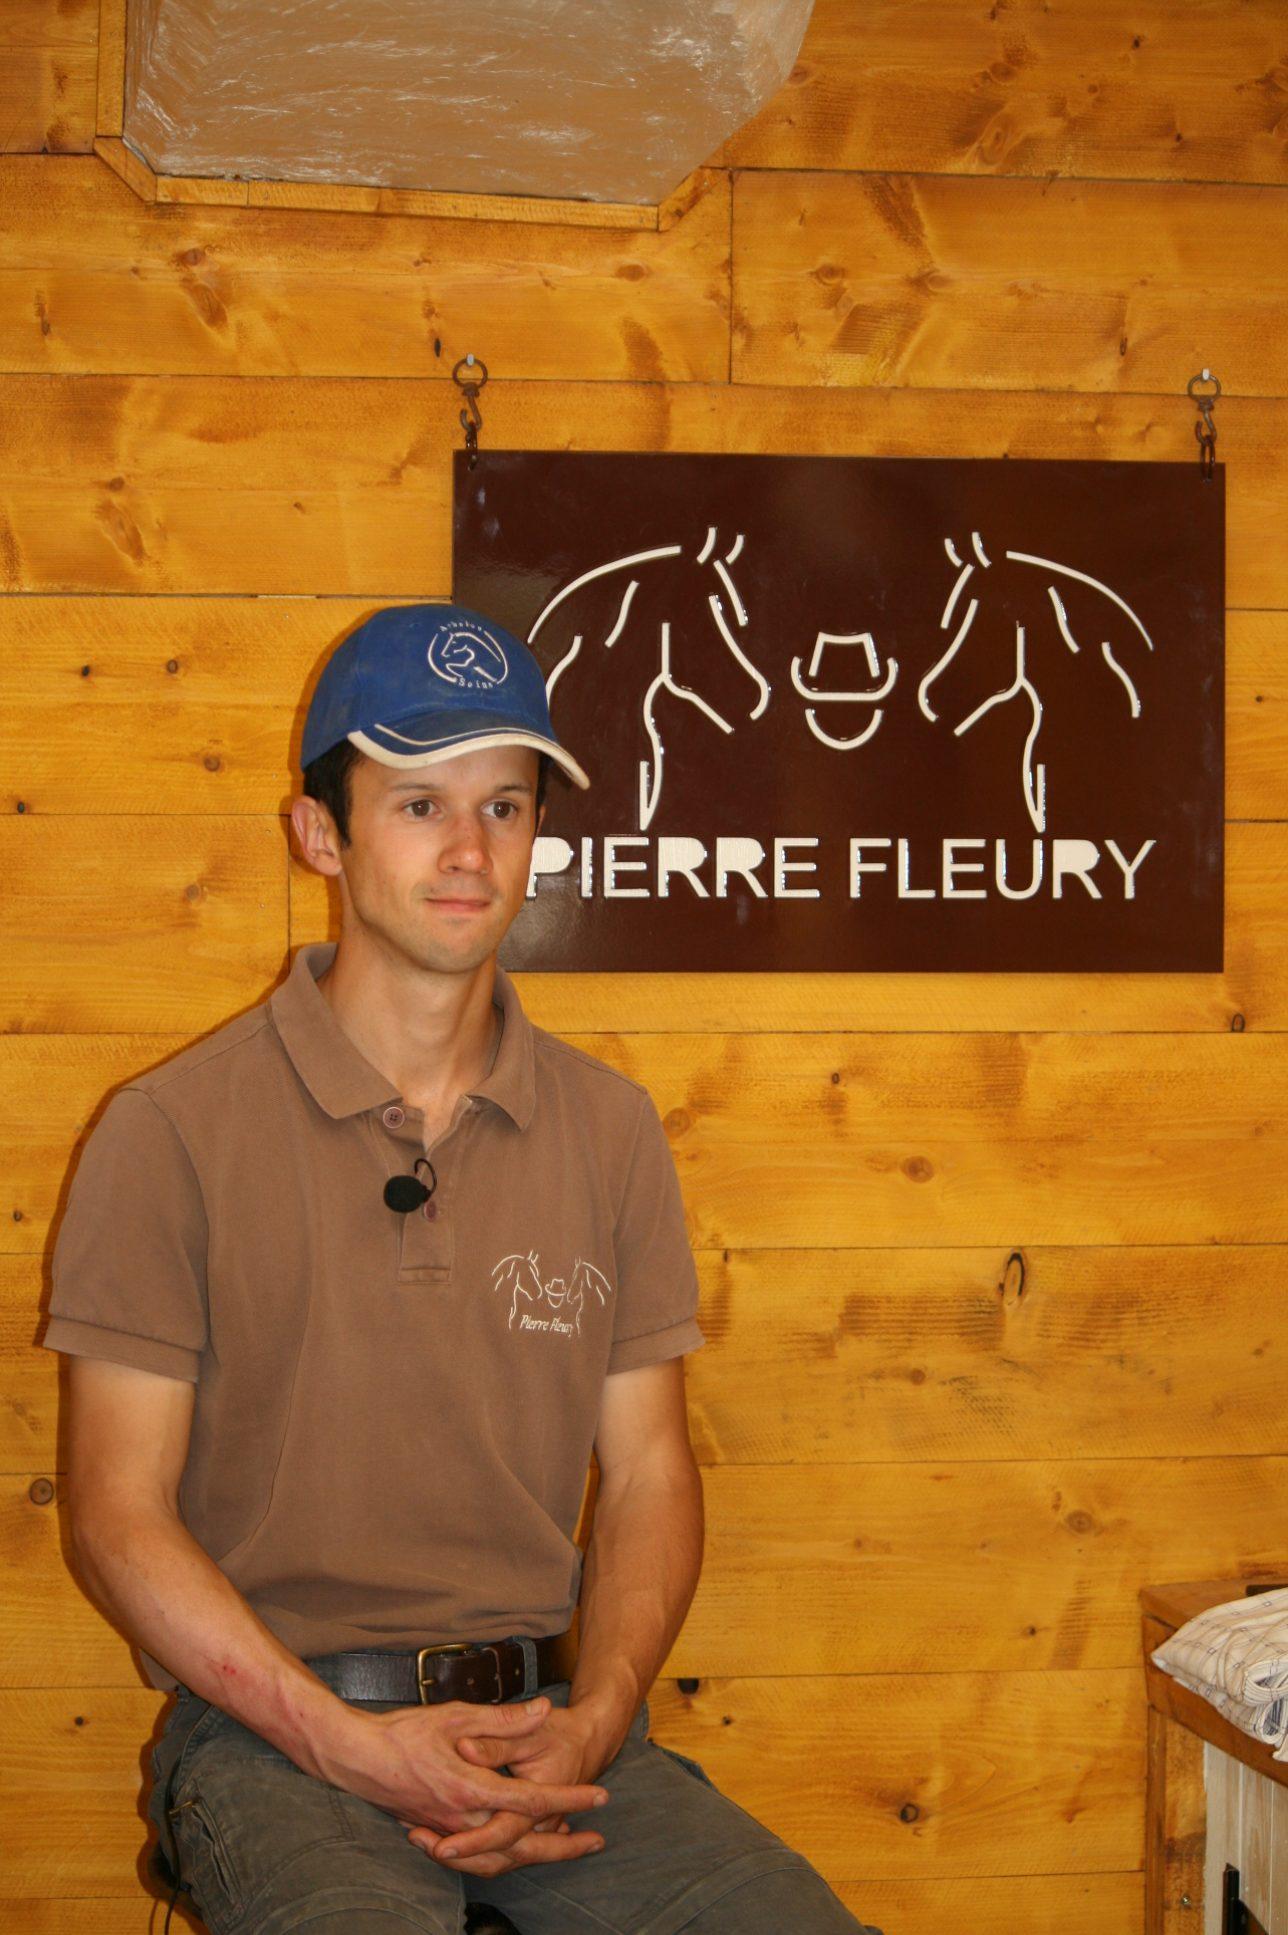 Pierre Fleury